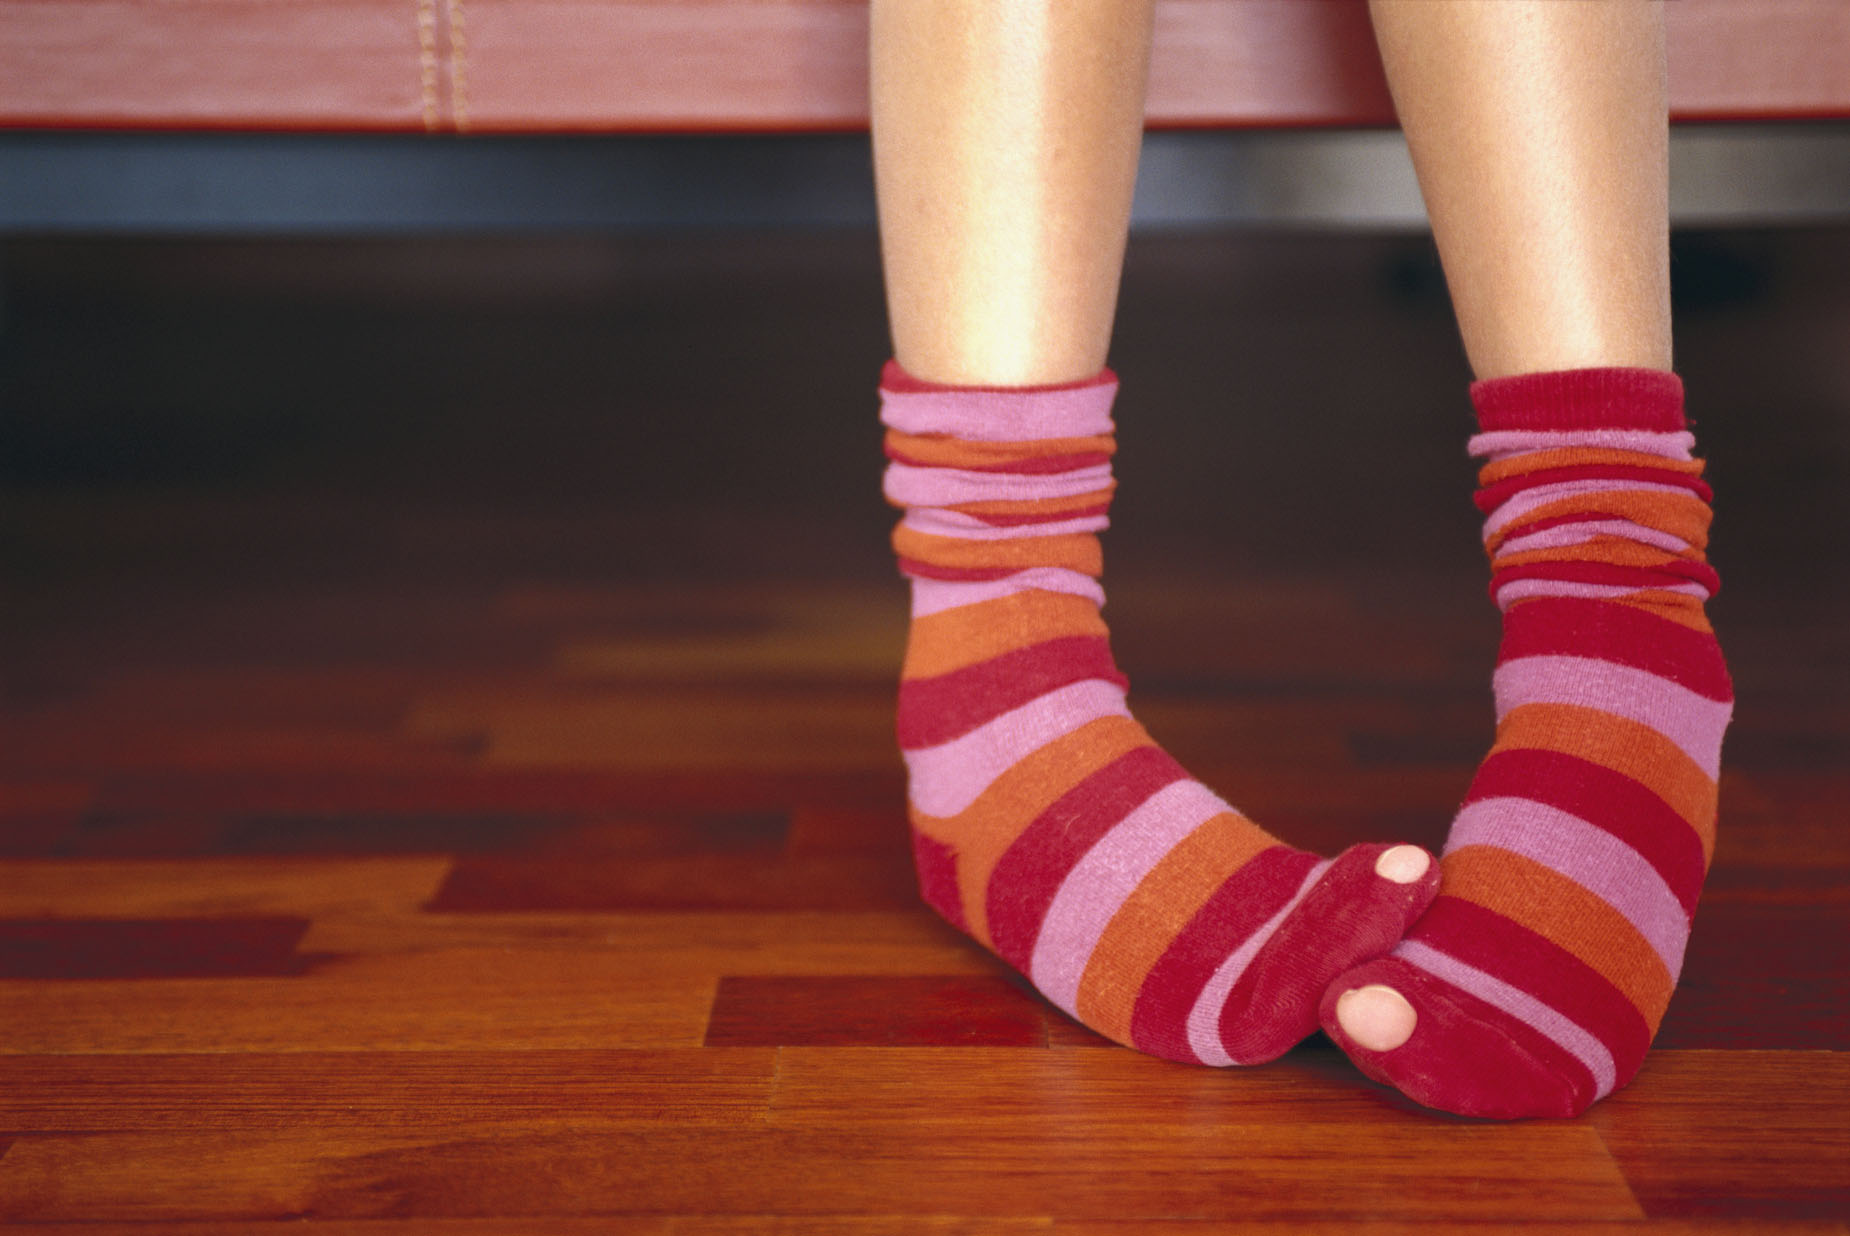 pieds qui picotent